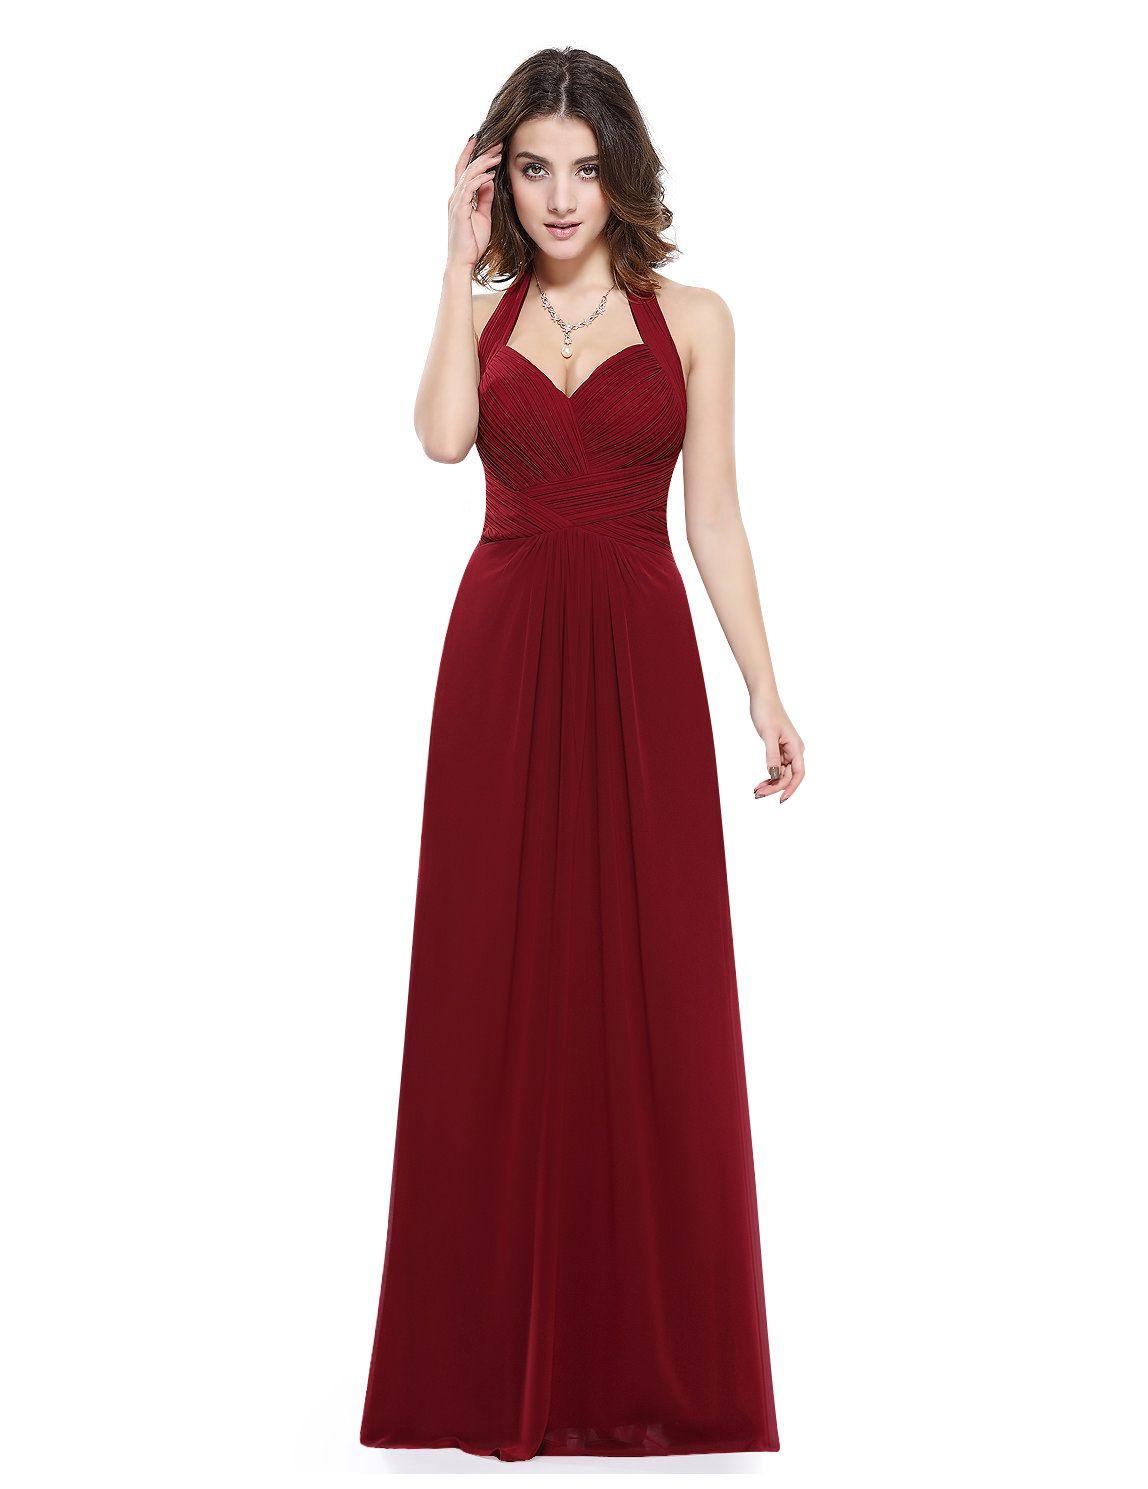 20 Schön Abendkleid Bordeaux Rot Galerie Erstaunlich Abendkleid Bordeaux Rot Design